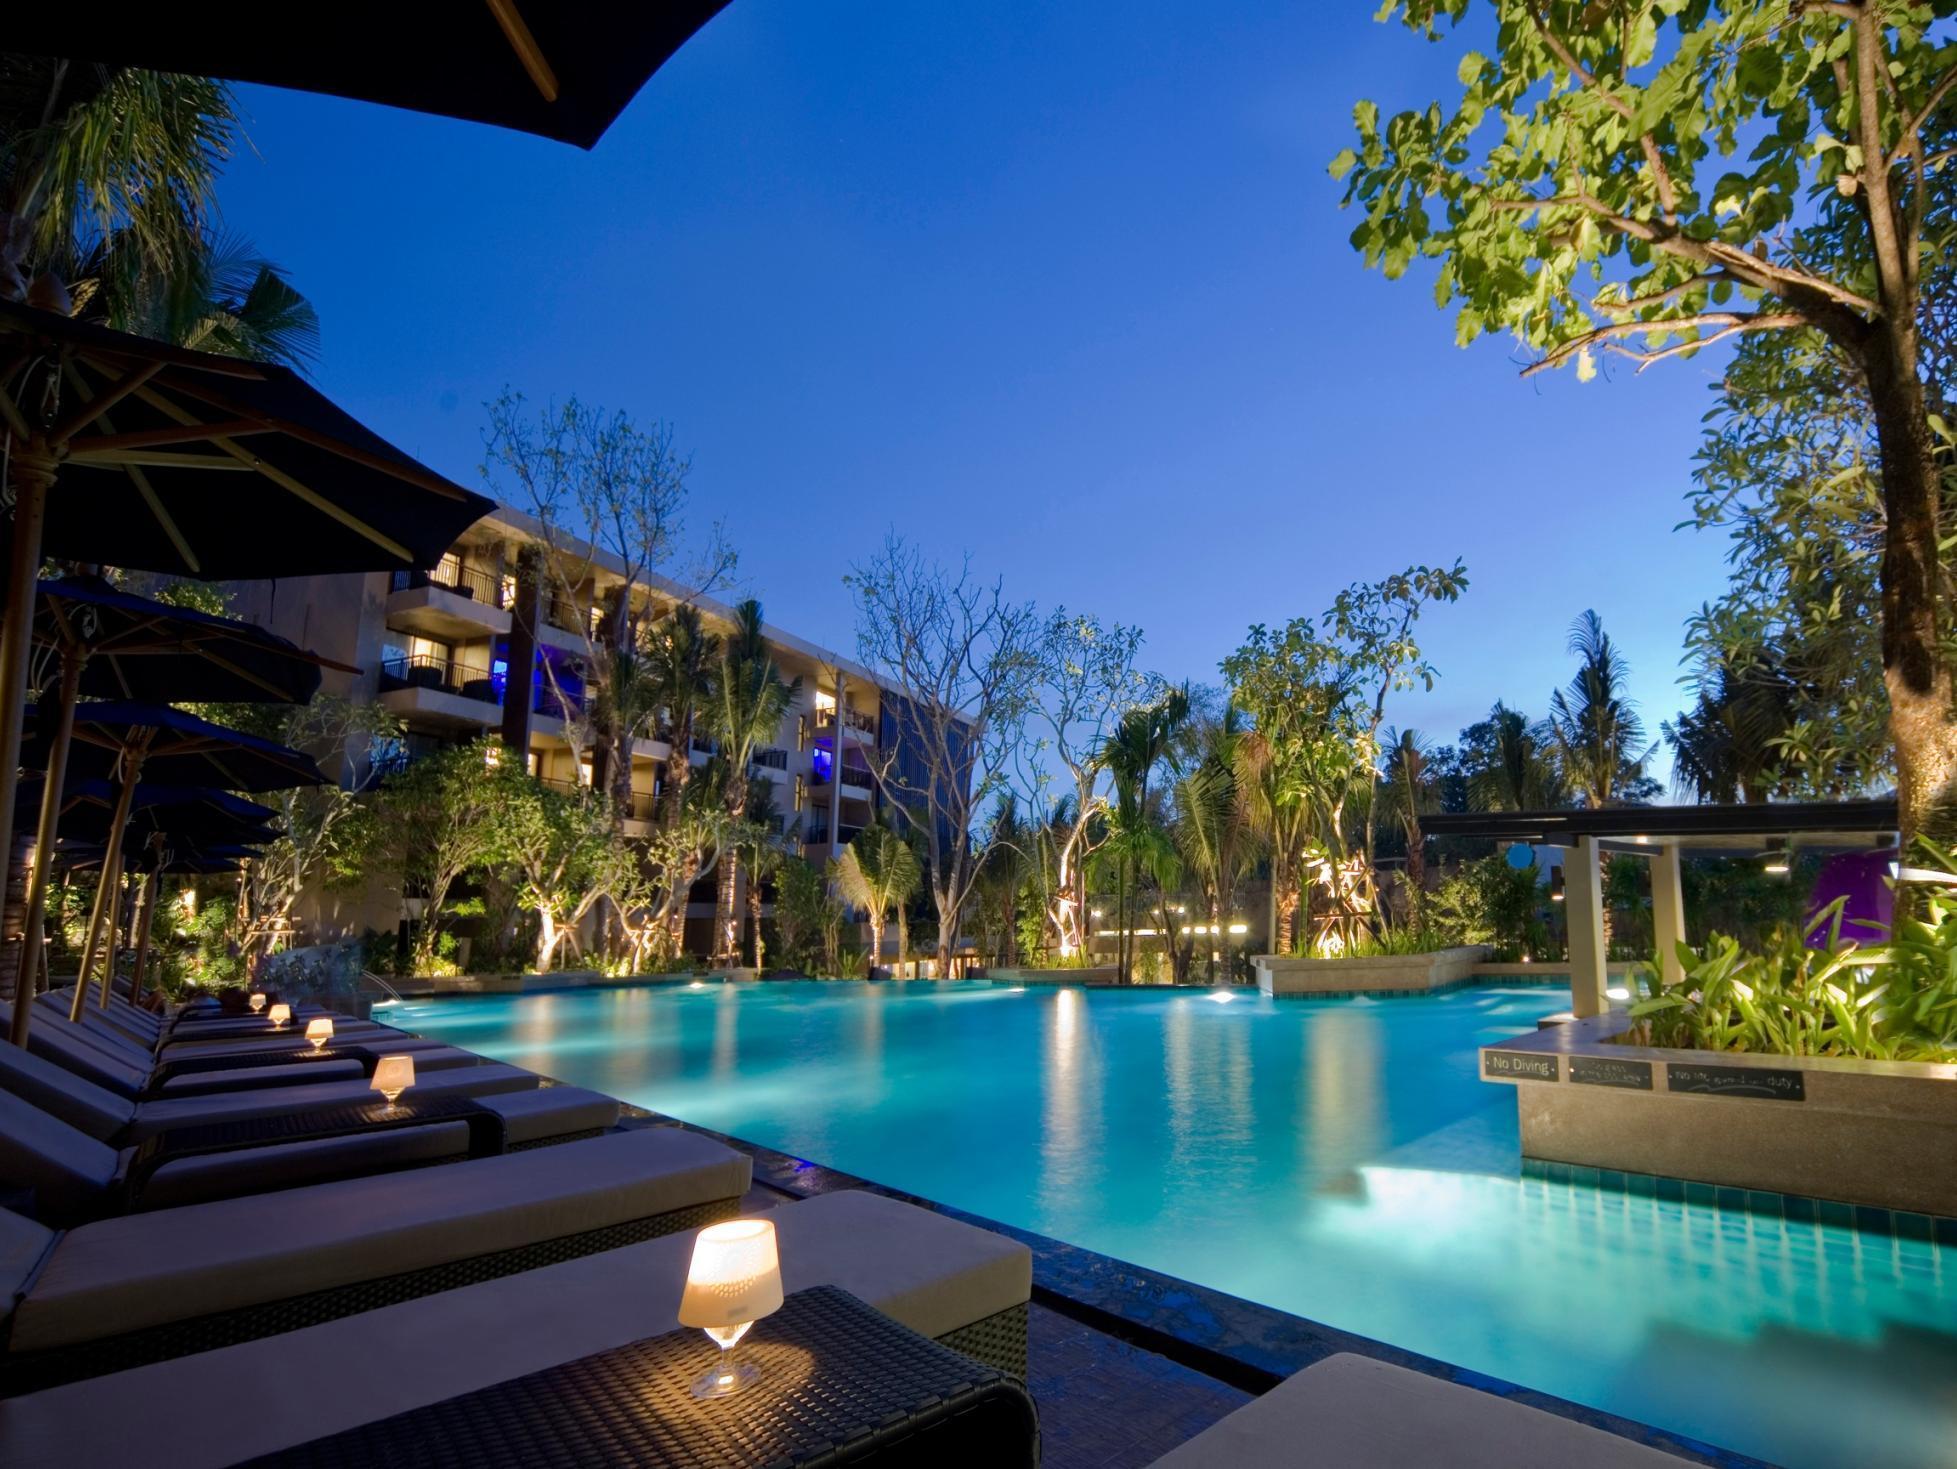 Novotel Phuket Kata Avista Resort & Spa - Phuket